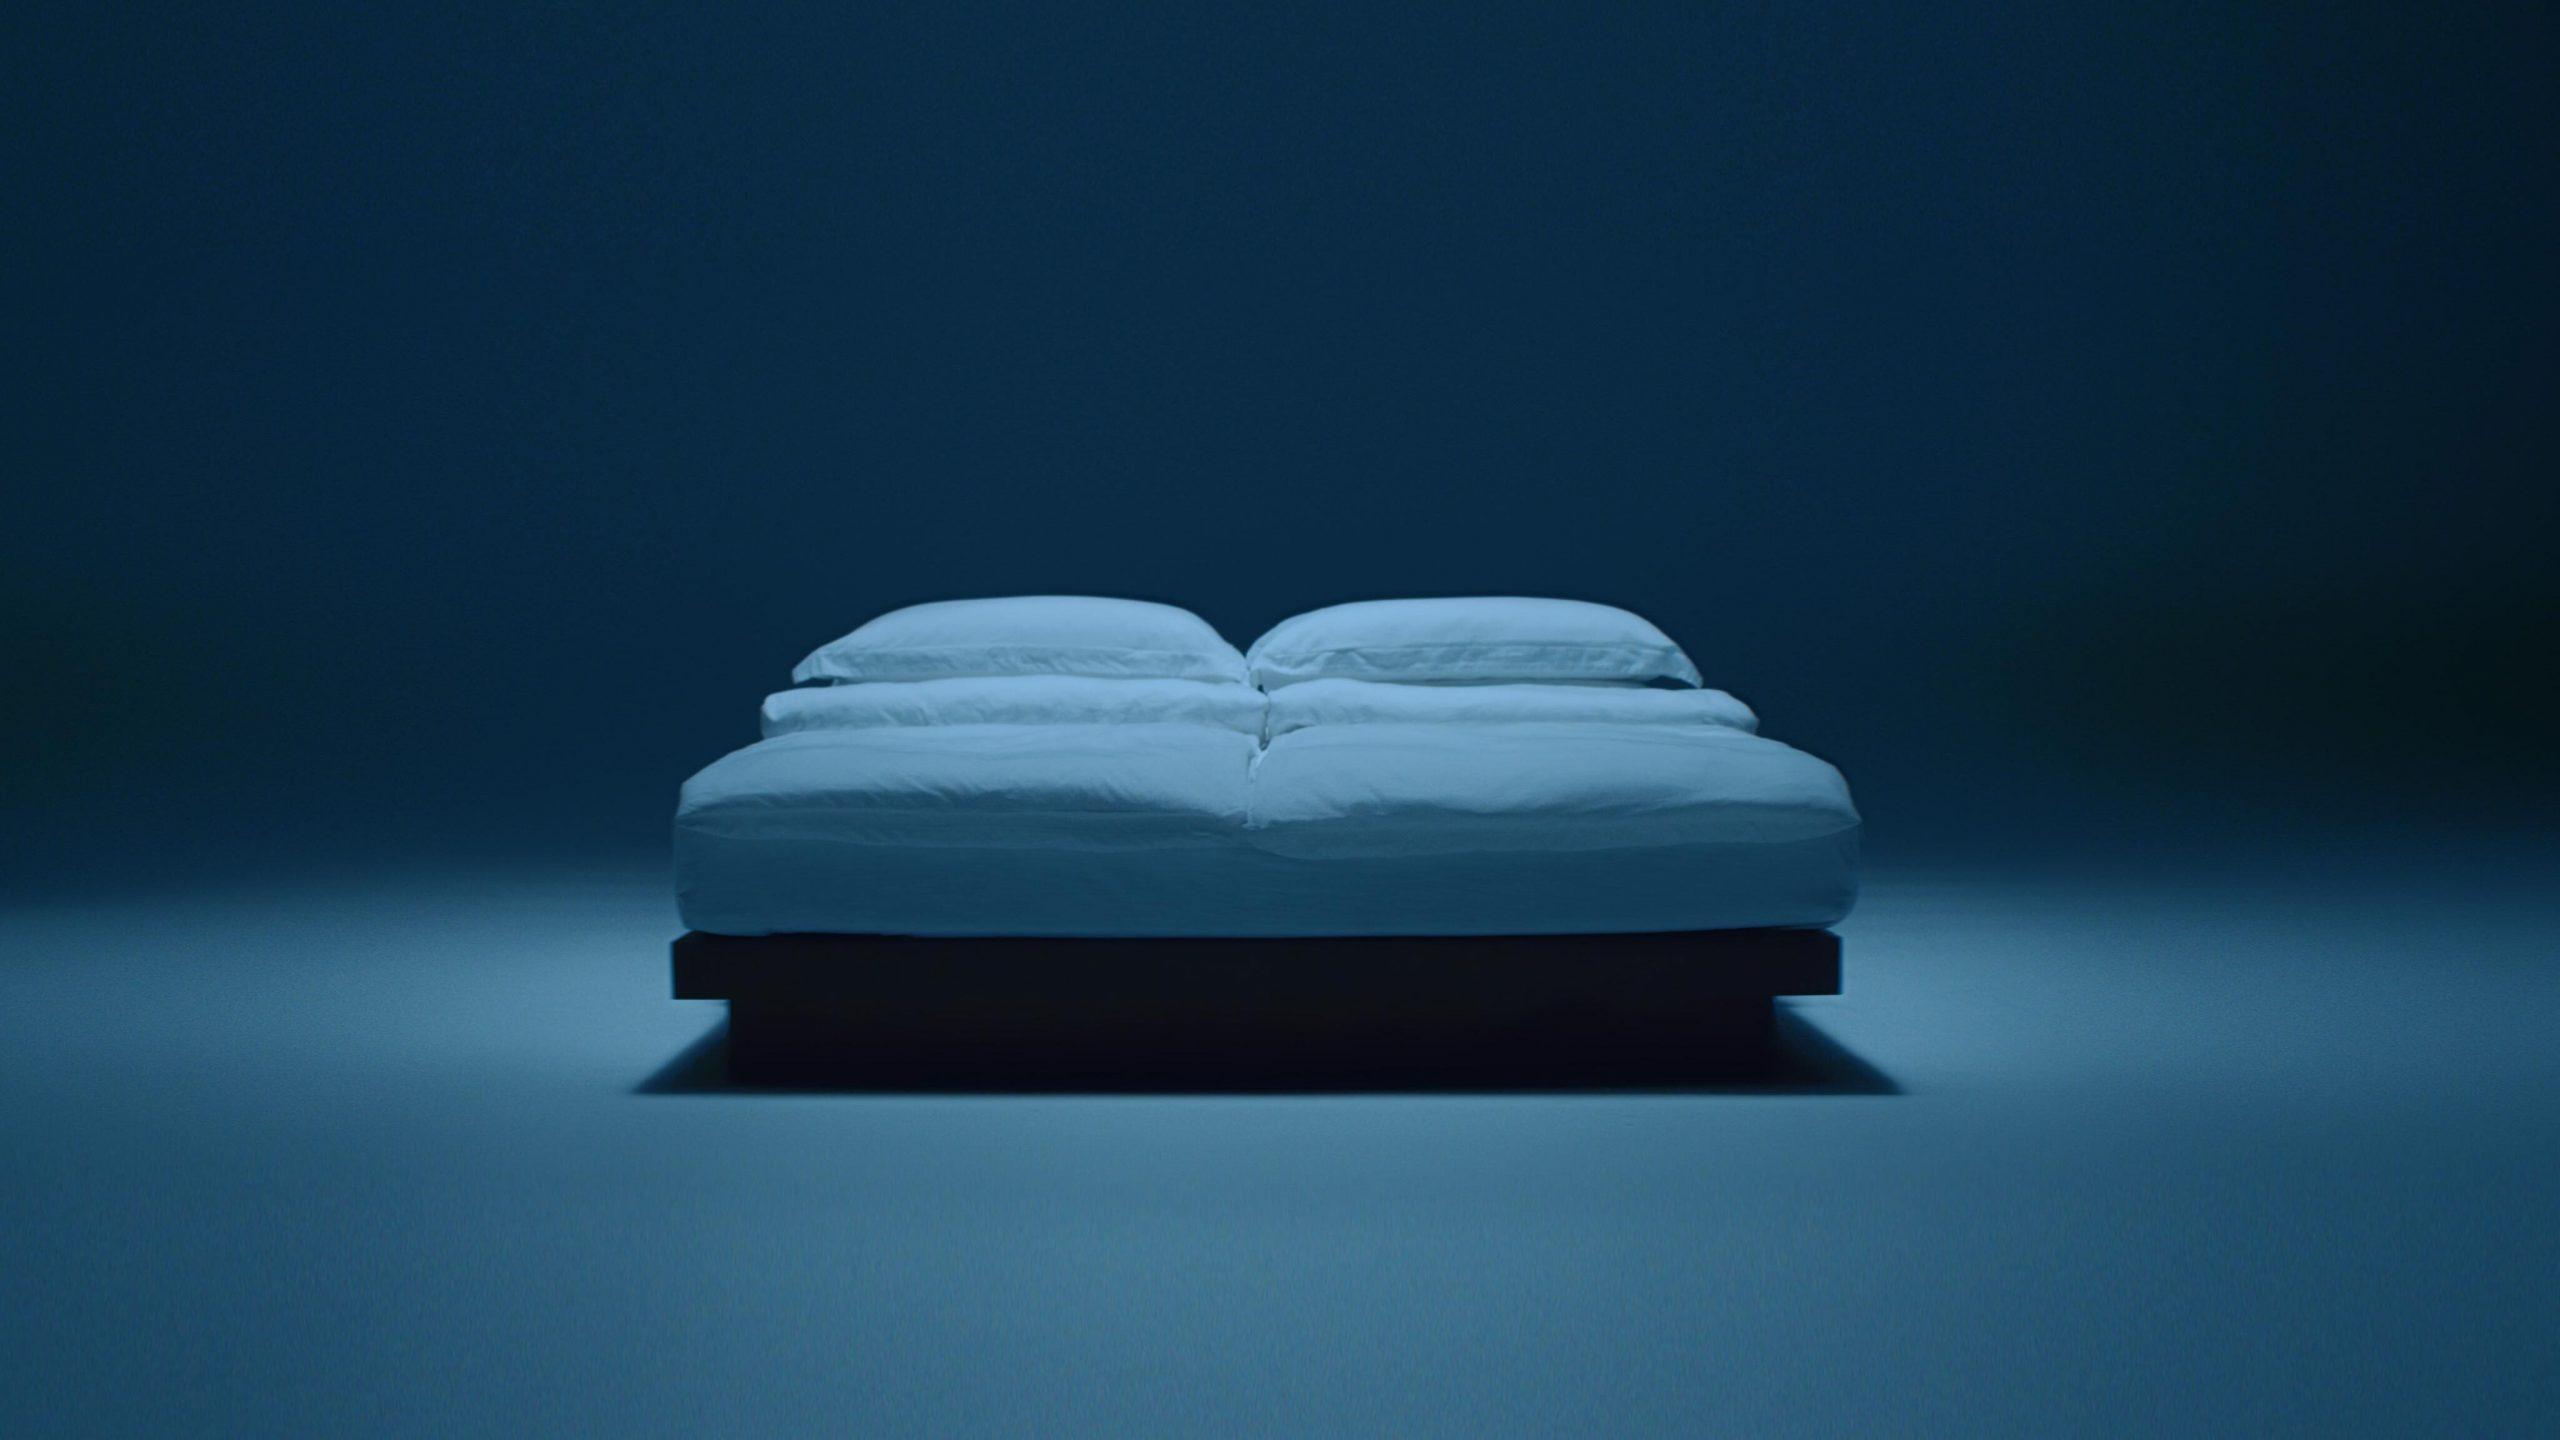 equinox sleep system bed